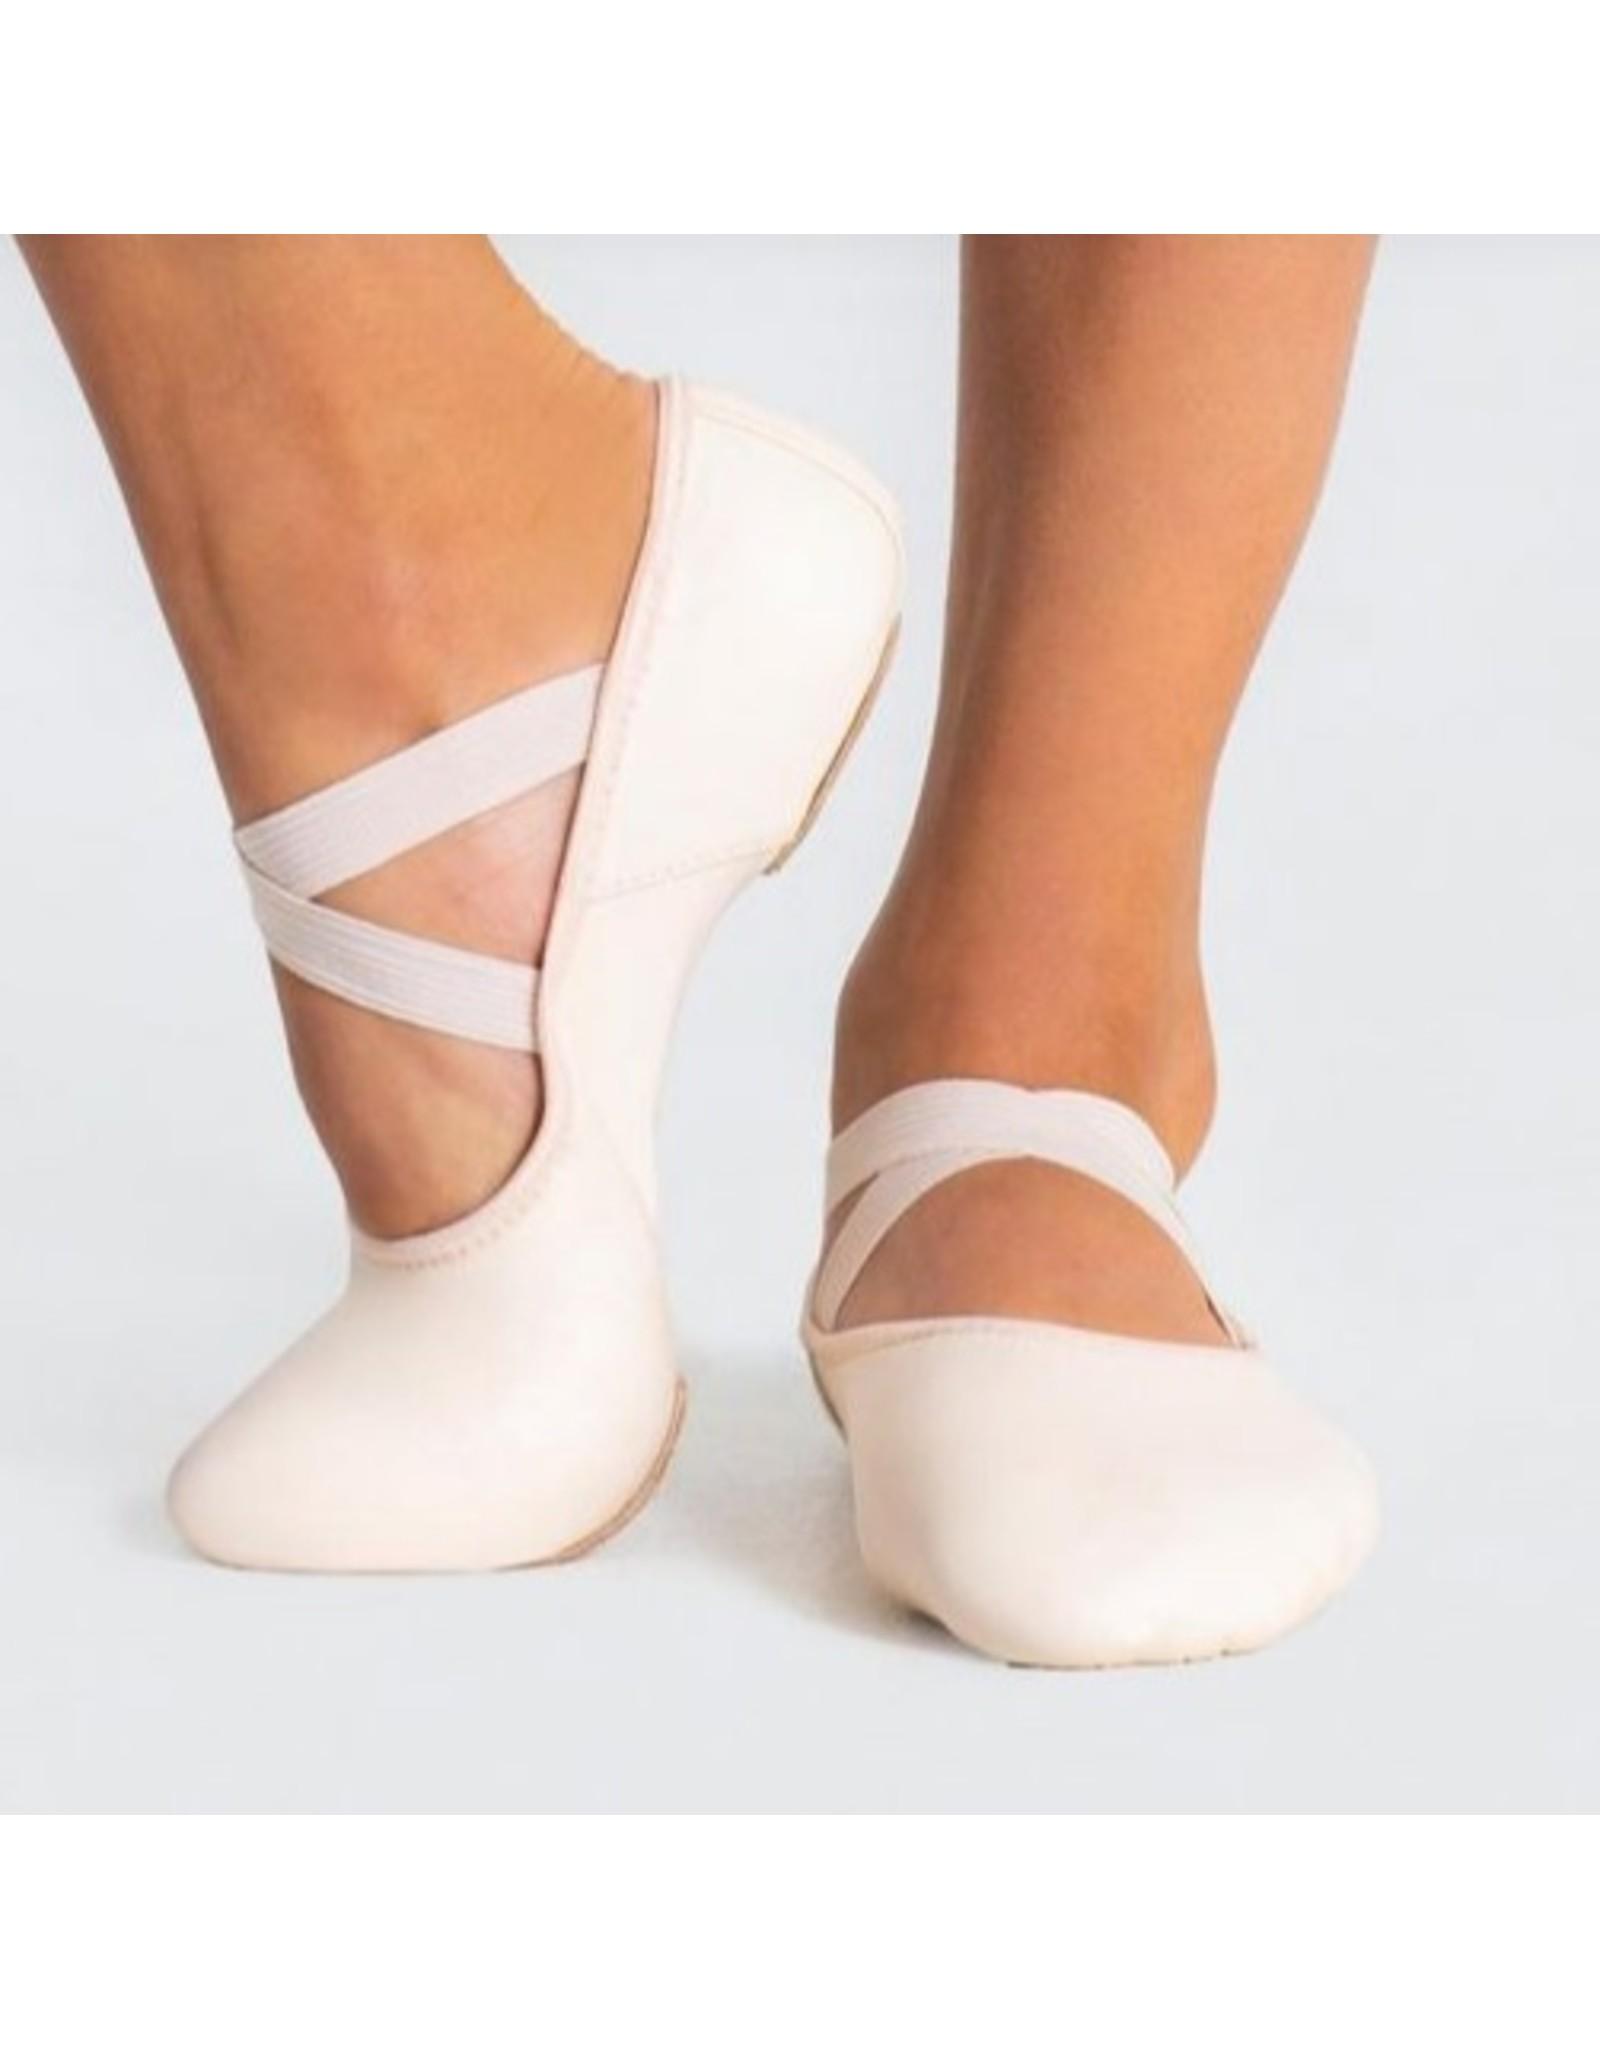 Capezio Hanami Soft Leather Ballet Slipper- Adult